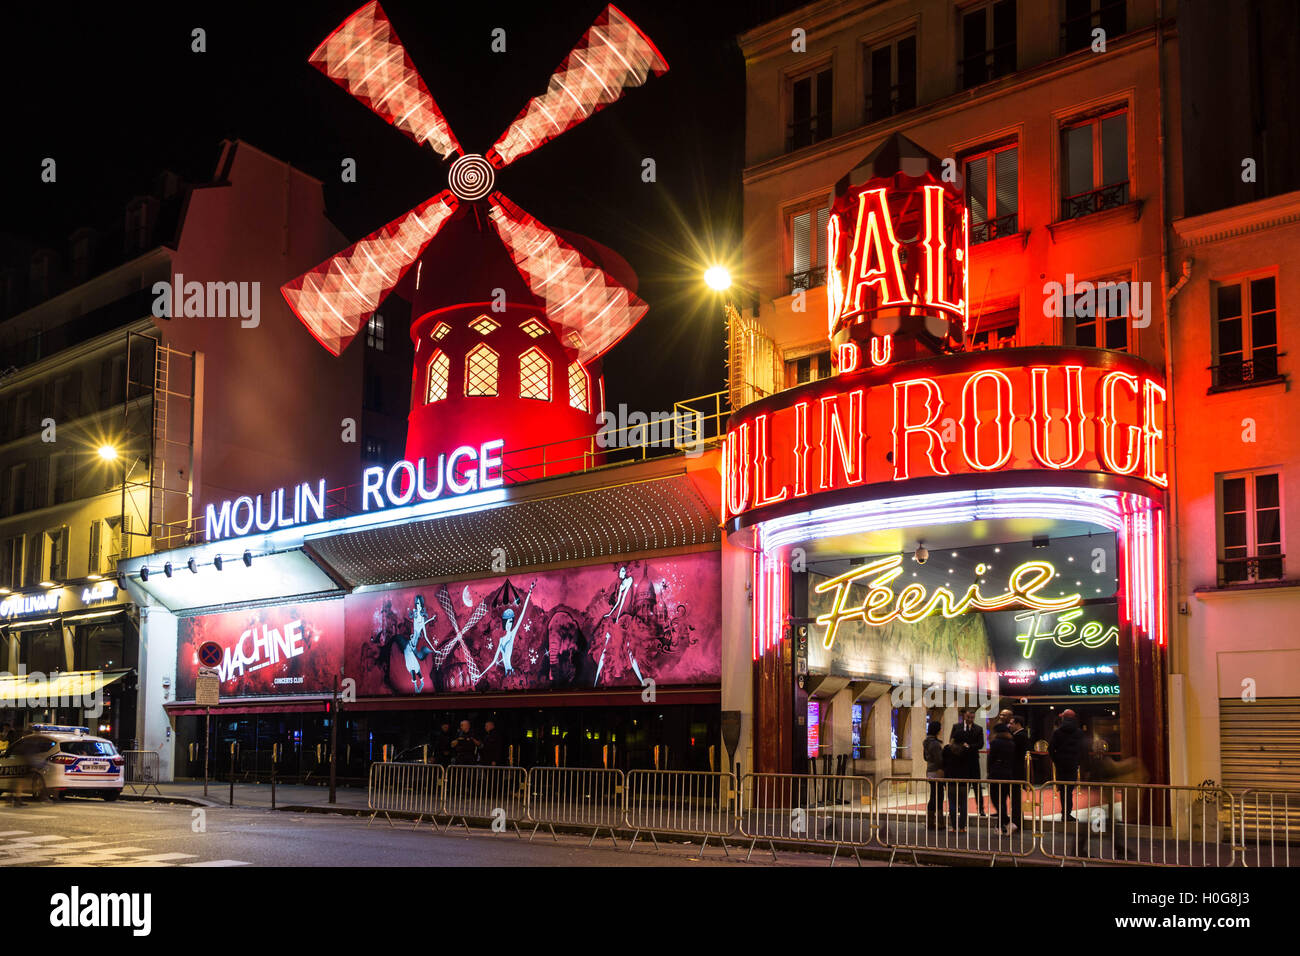 Paris, France-October 11, 2015: The cabaret Moulin Rouge at night.Paris, France. - Stock Image